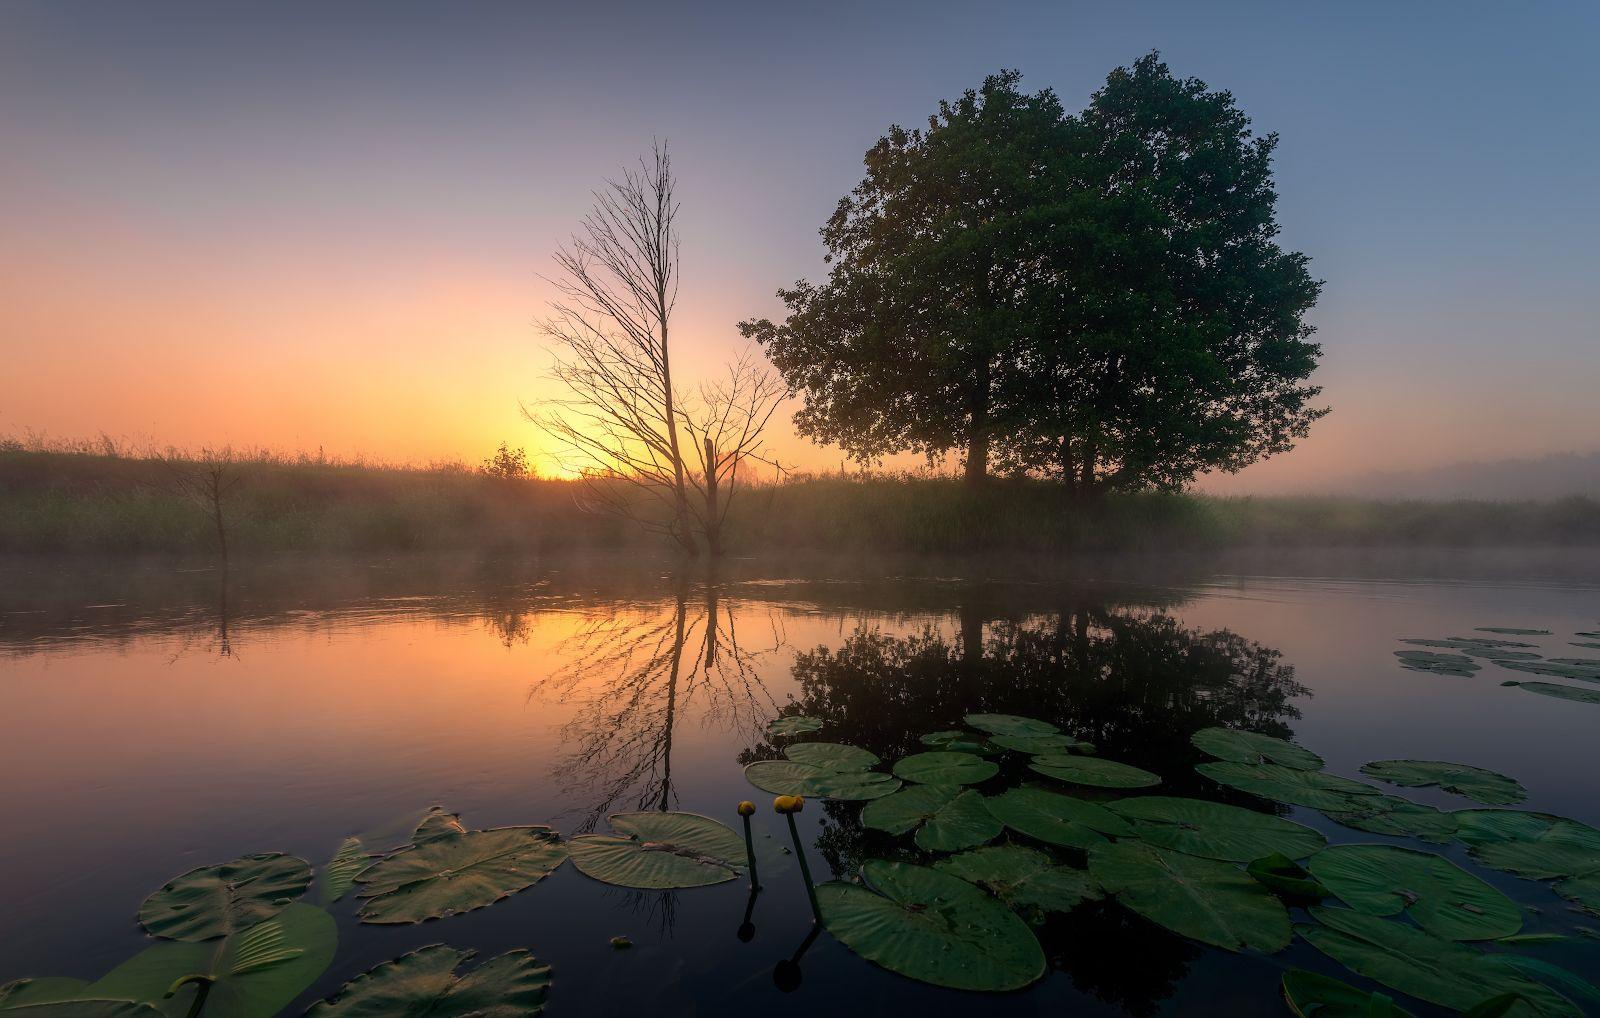 Утренняя утро лето рассвет пейзаж